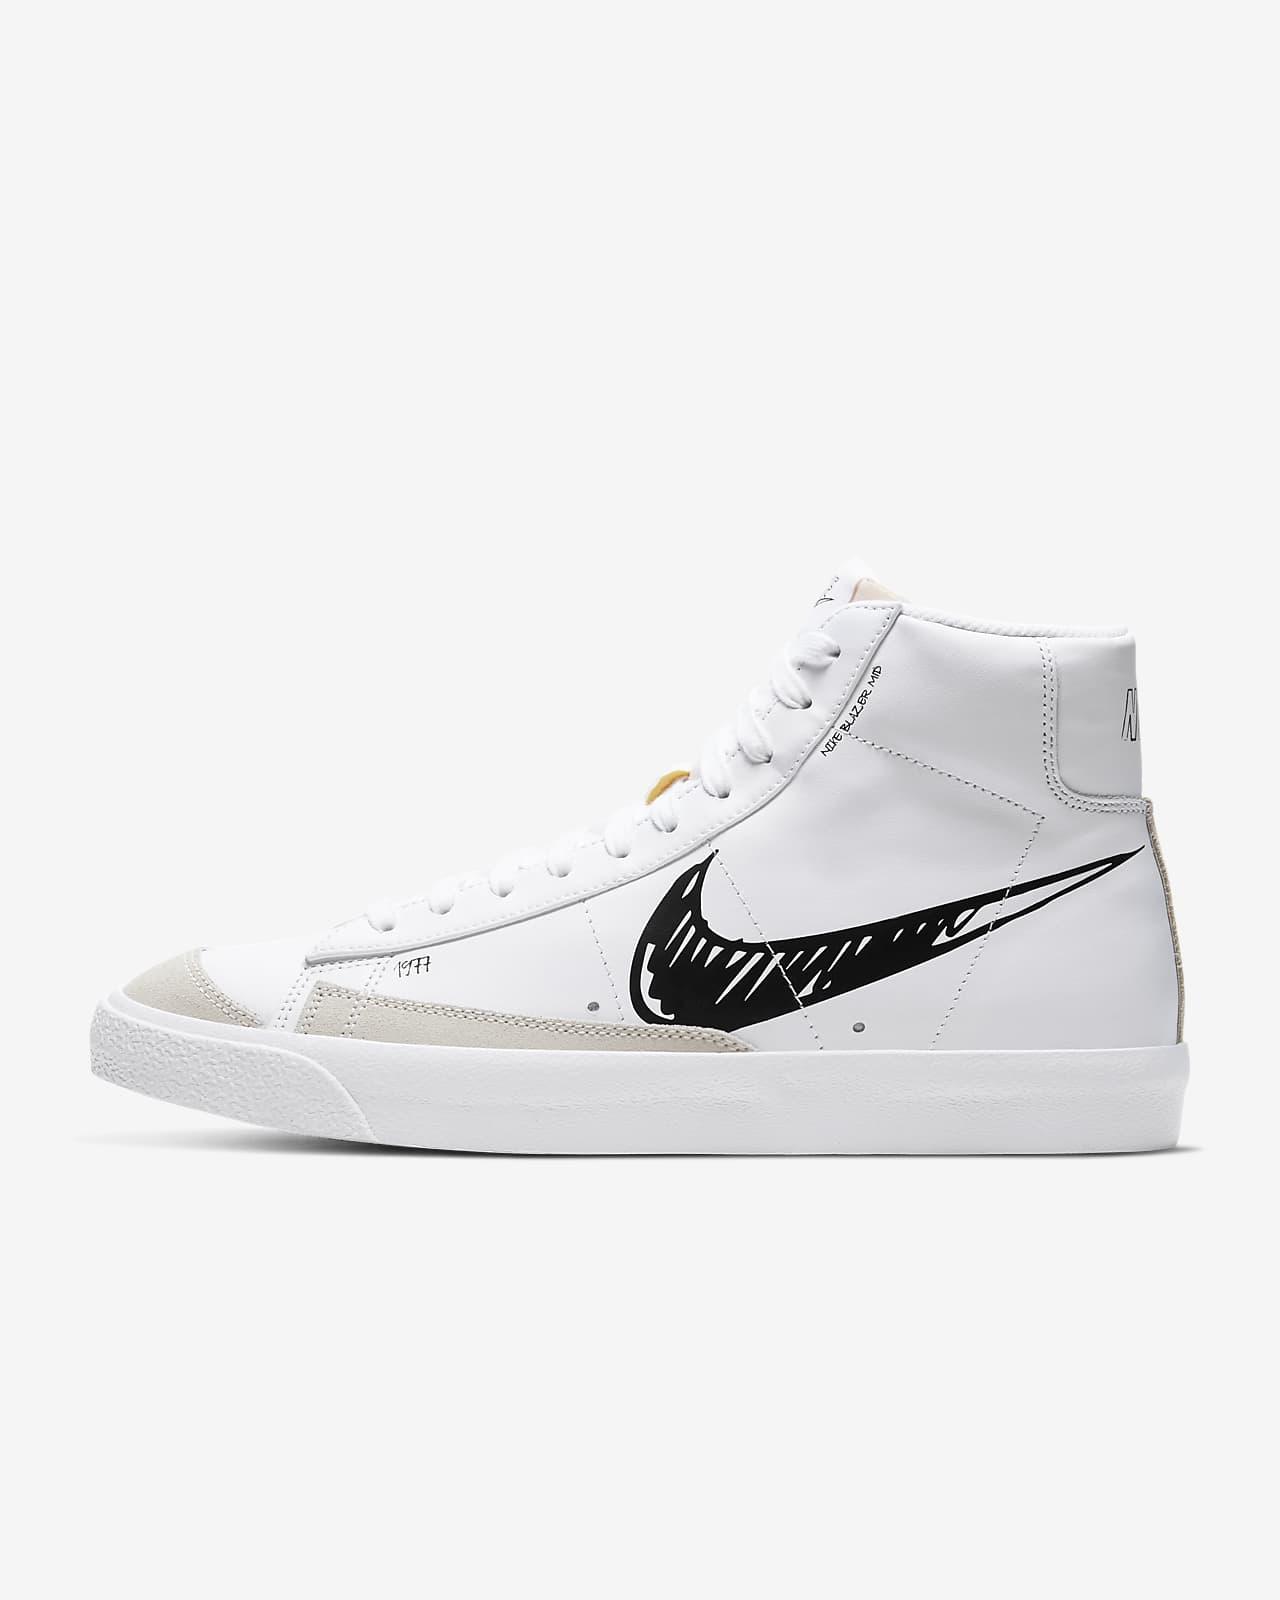 Nike Blazer Mid Vintage '77 Shoe. Nike DK